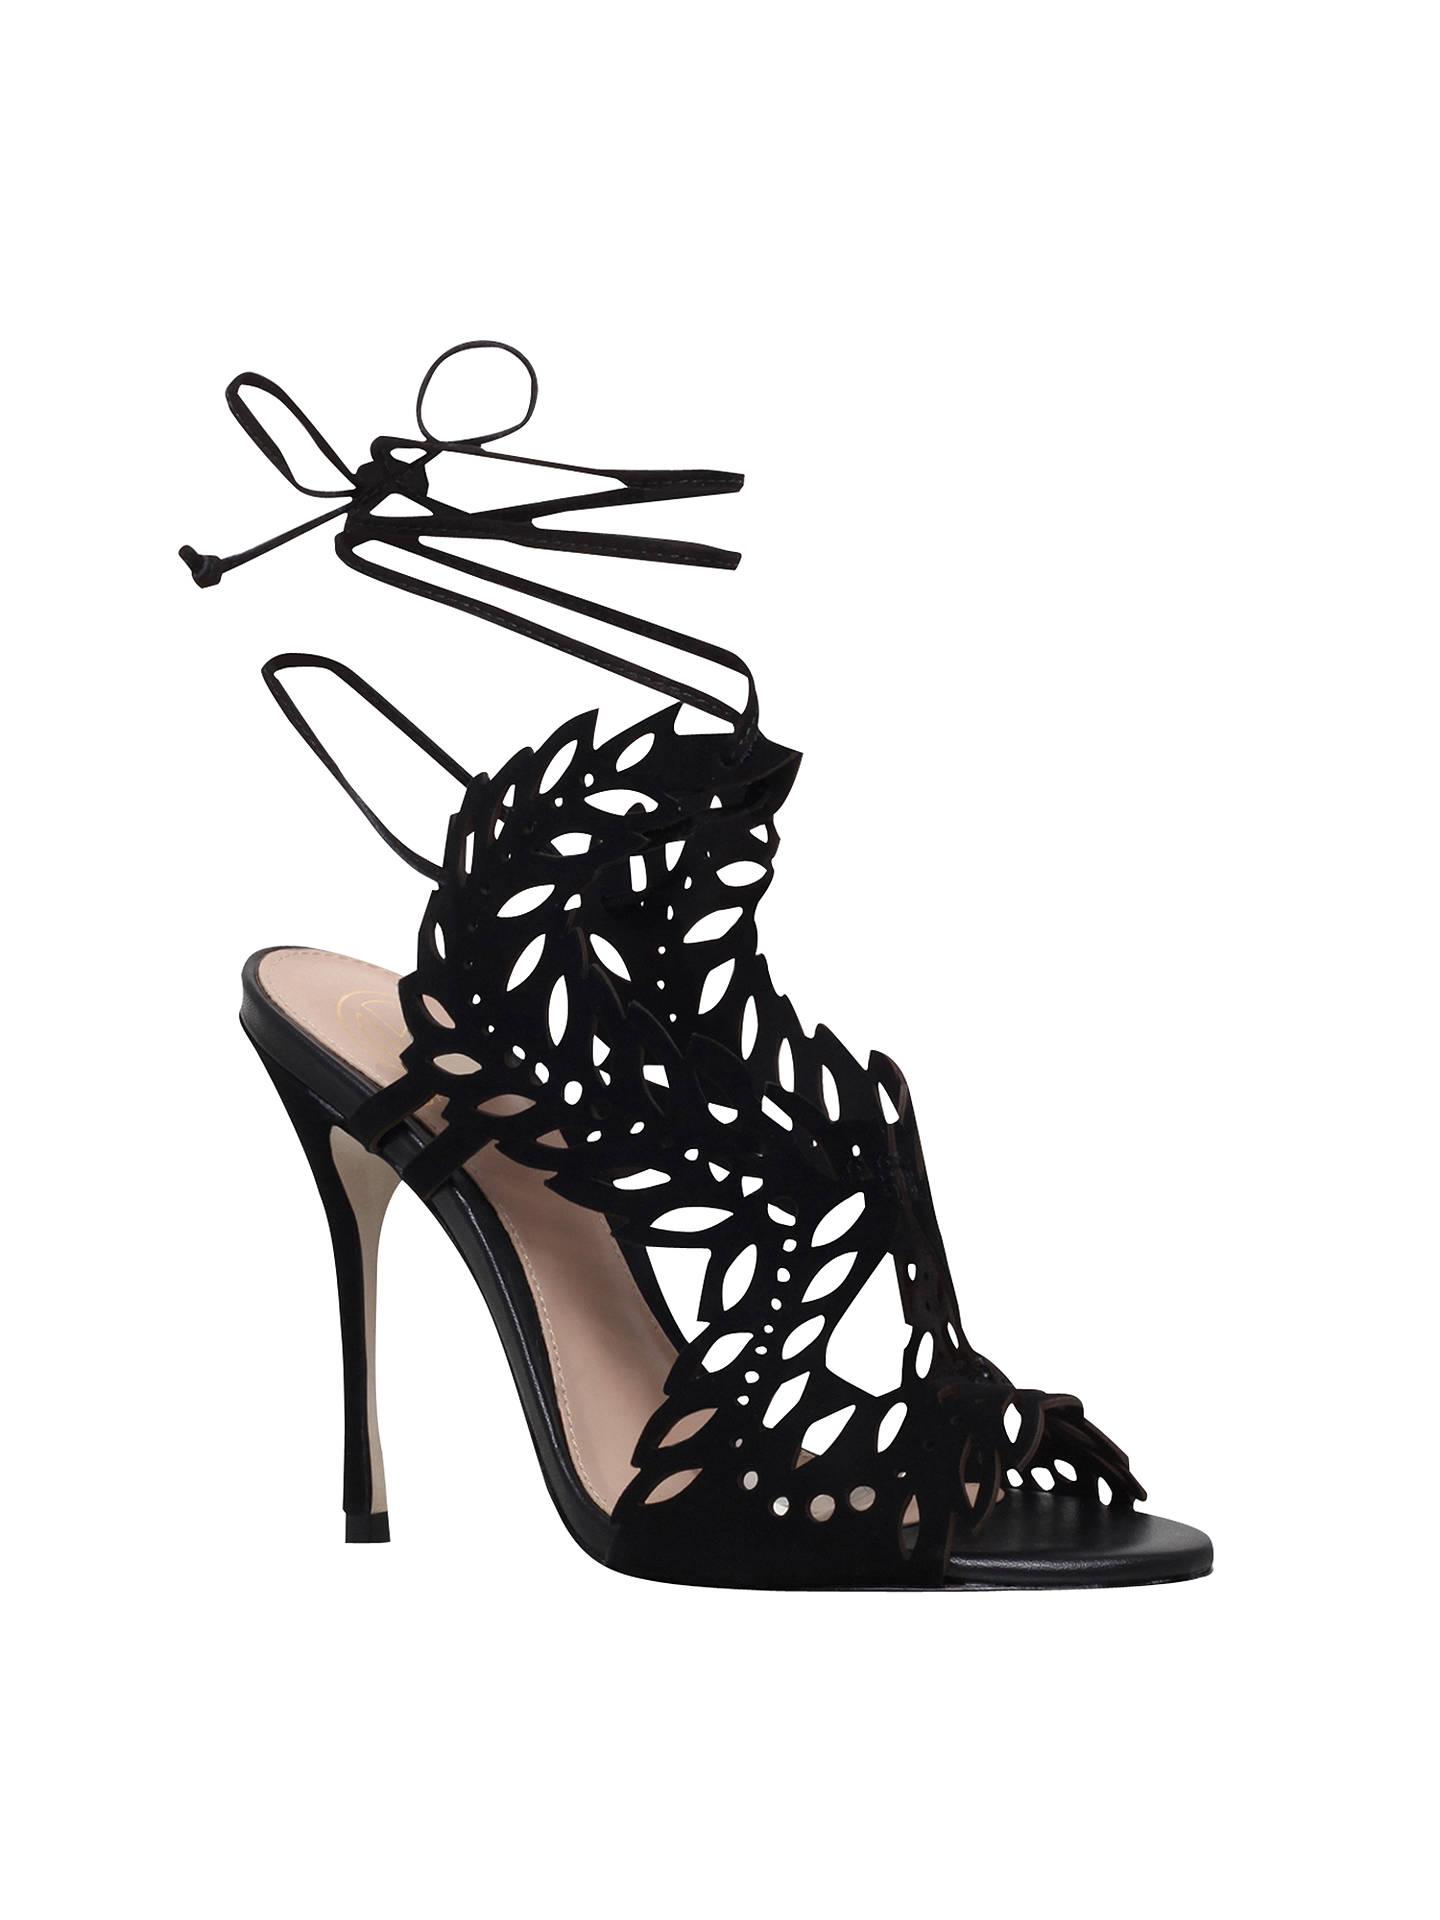 59f8061efa8 Buy KG by Kurt Geiger Horatio Cut Out Stiletto Sandals